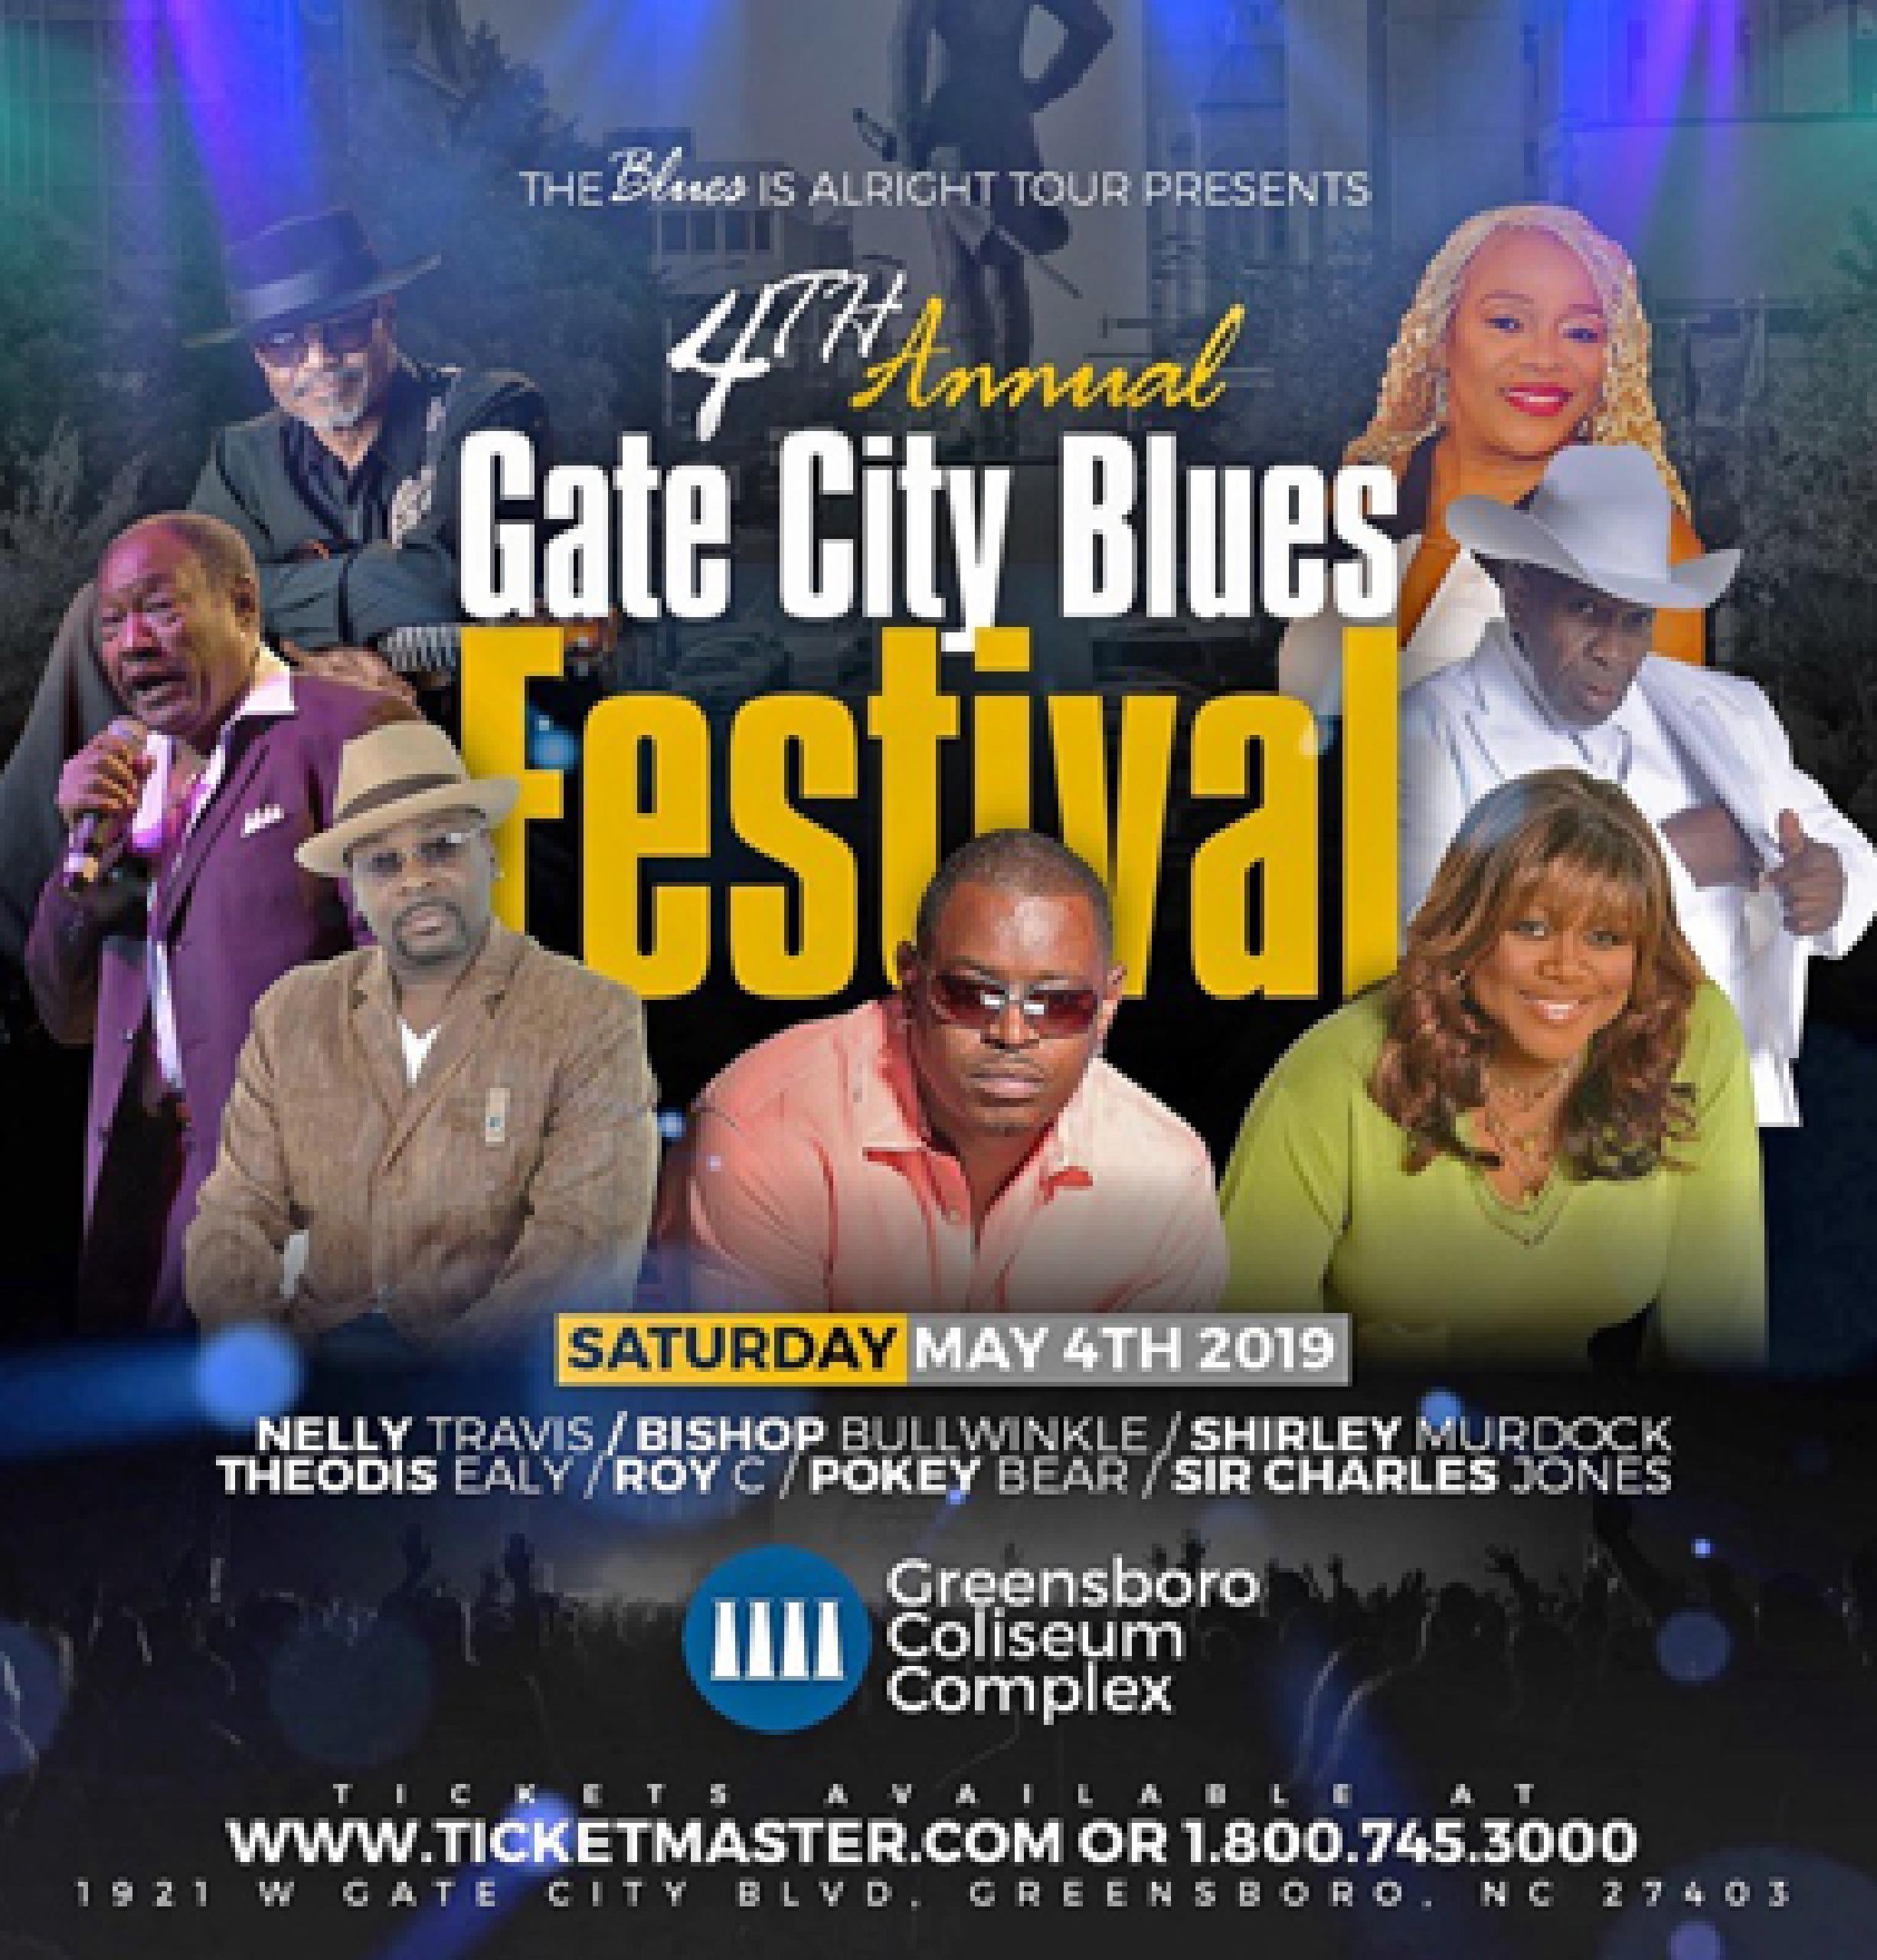 Gate City Blues Festival